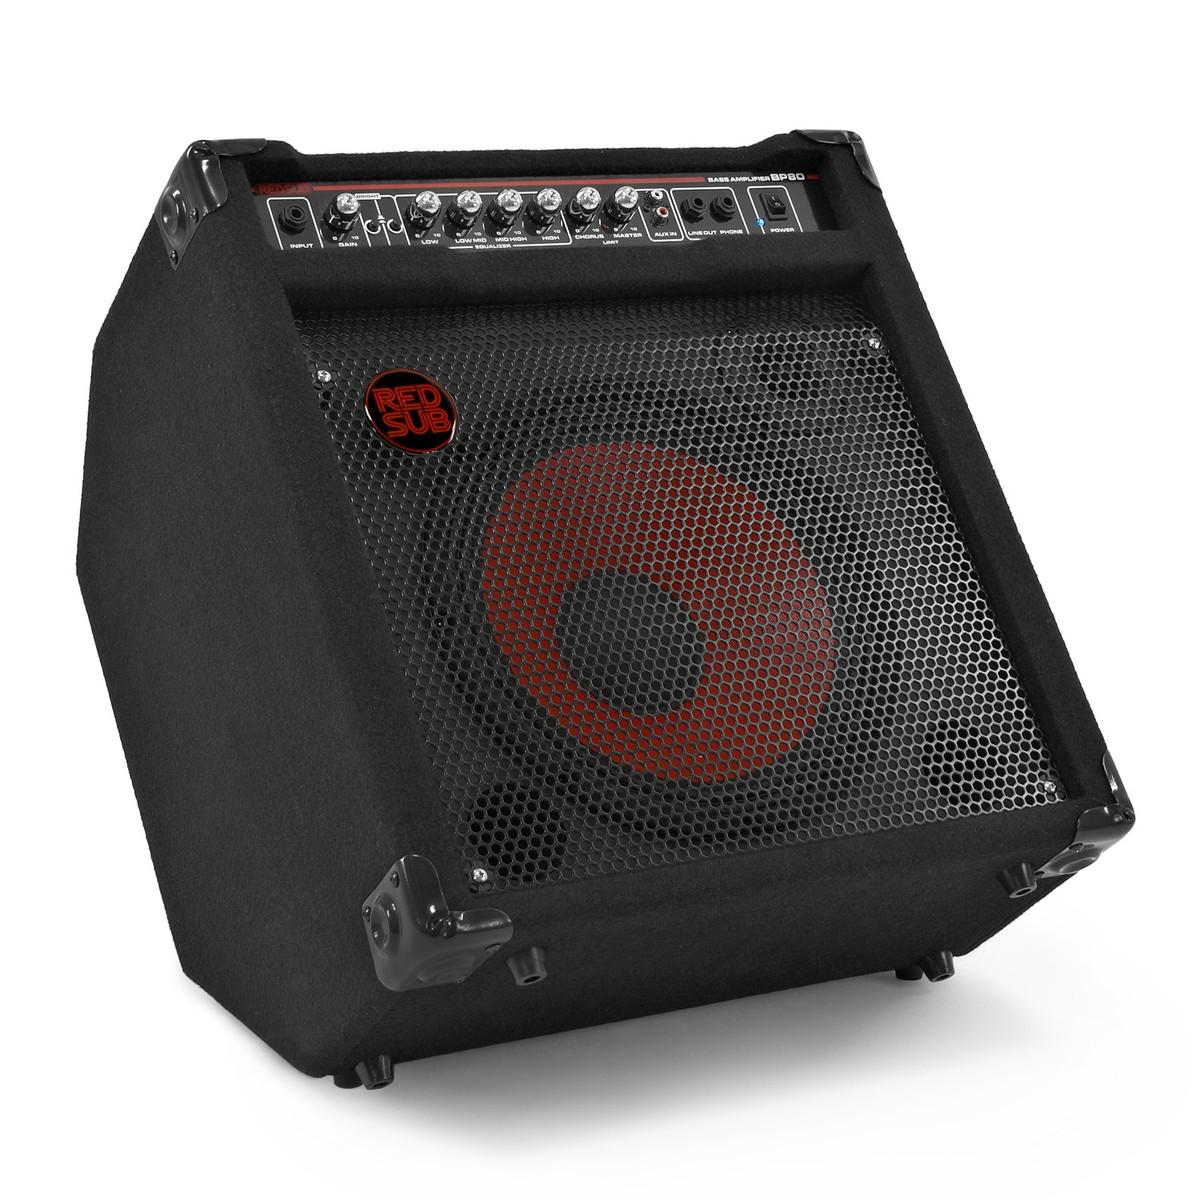 redsub bp80 80w bass guitar amplifier box opened at gear4music. Black Bedroom Furniture Sets. Home Design Ideas